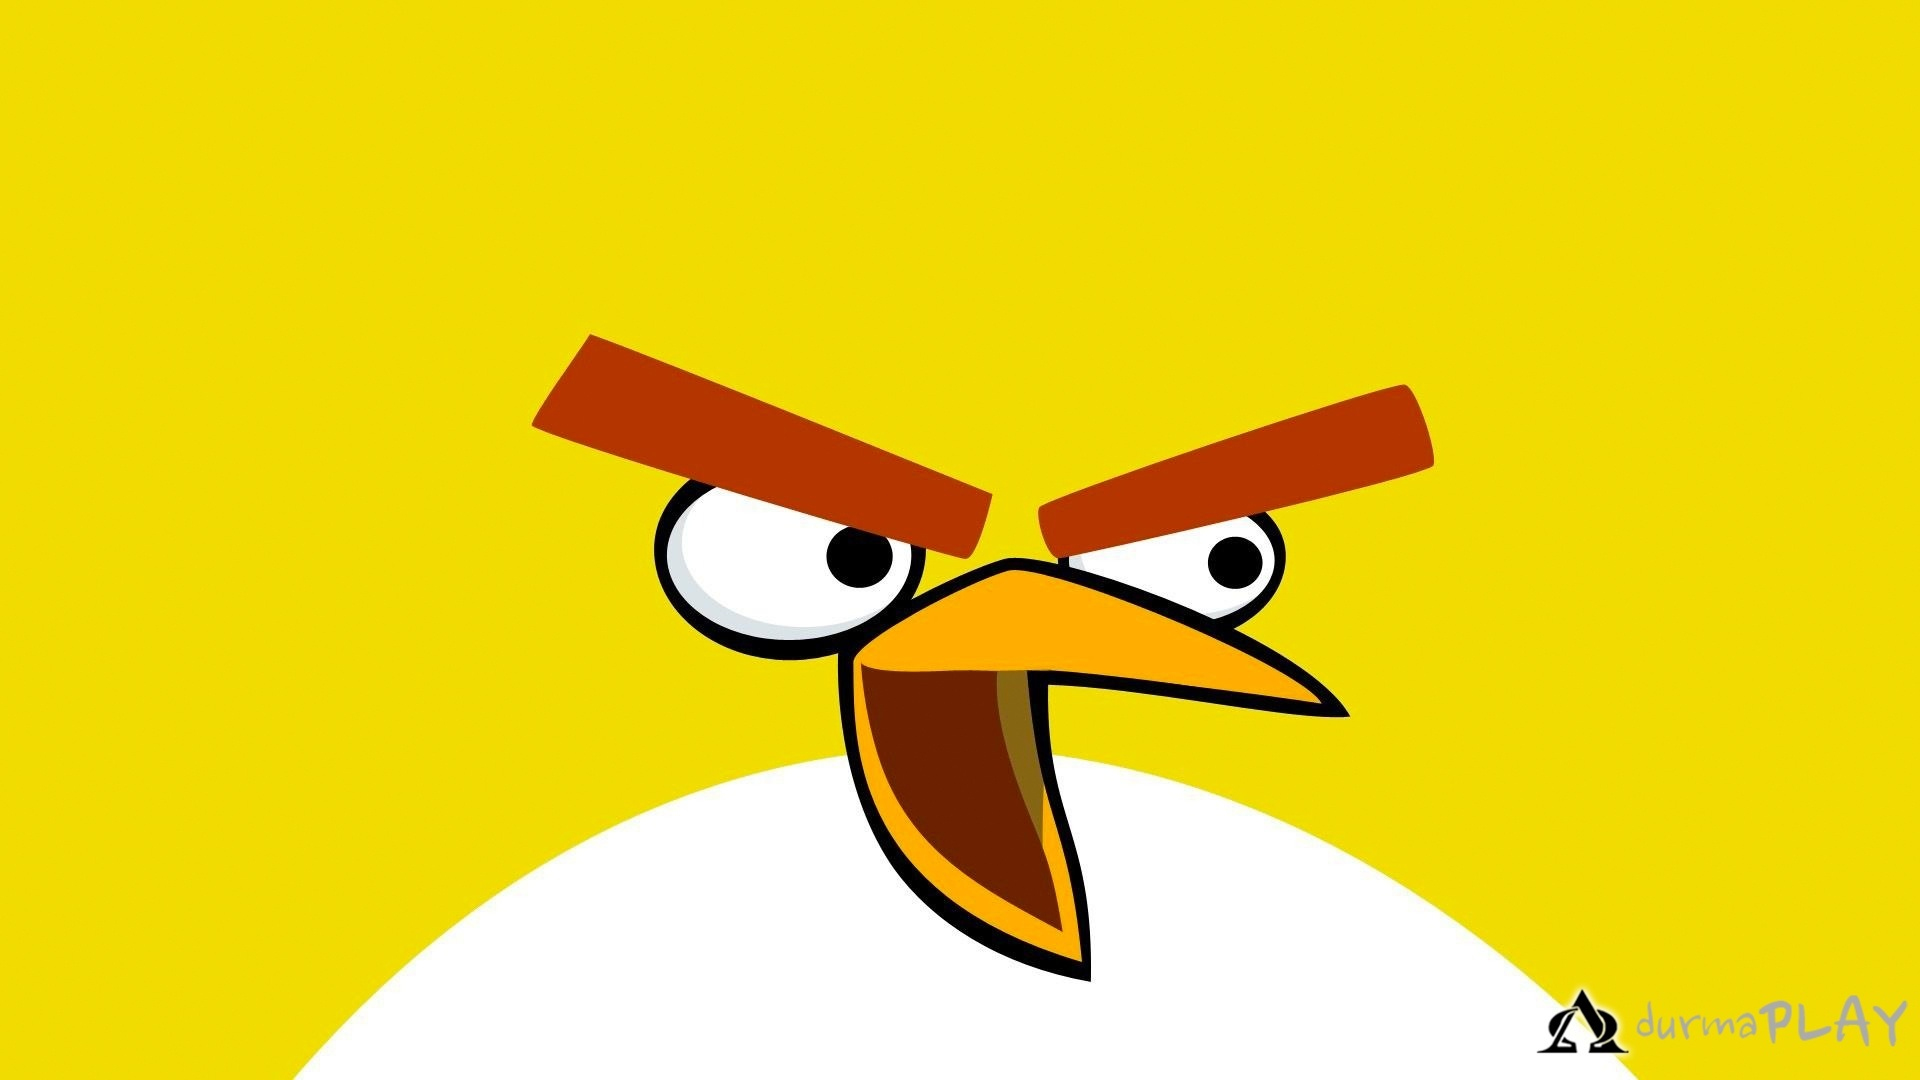 https-www-durmaplay-com-product-angry-birds-friends-angry-birds-friends-facebook-oyun-kartlari-wallpaper-wpc5806125